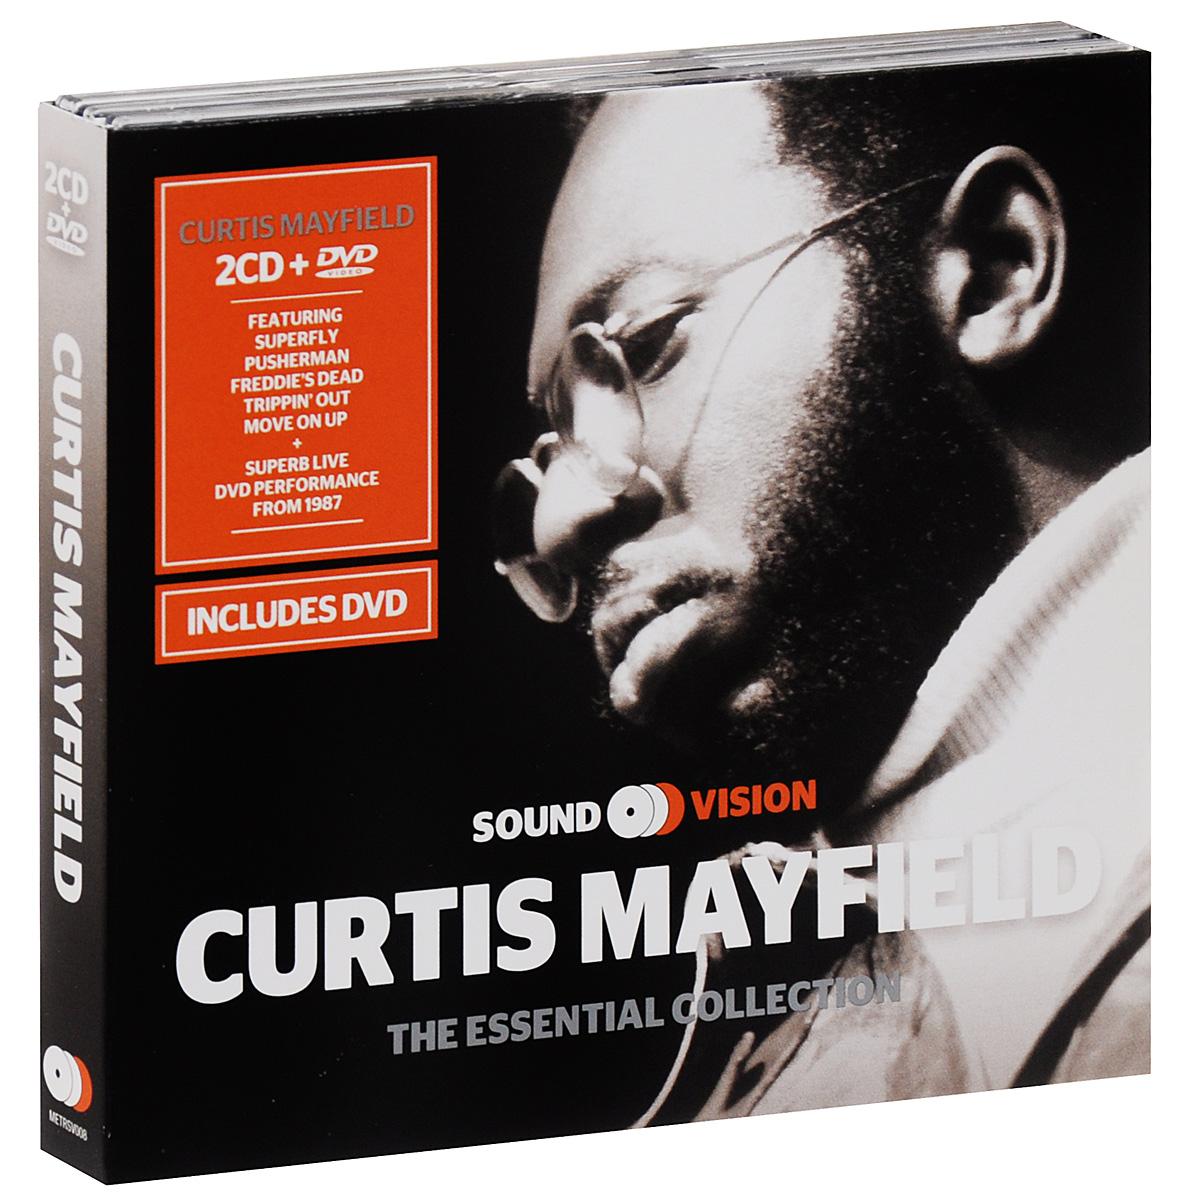 Кертис Мэйфилд Curtis Mayfield. The Essential Collection (2 CD + DVD) curtis mayfield curtis mayfield keep on keeping on curtis mayfield studio albums 1970 1974 4 lp 180 gr